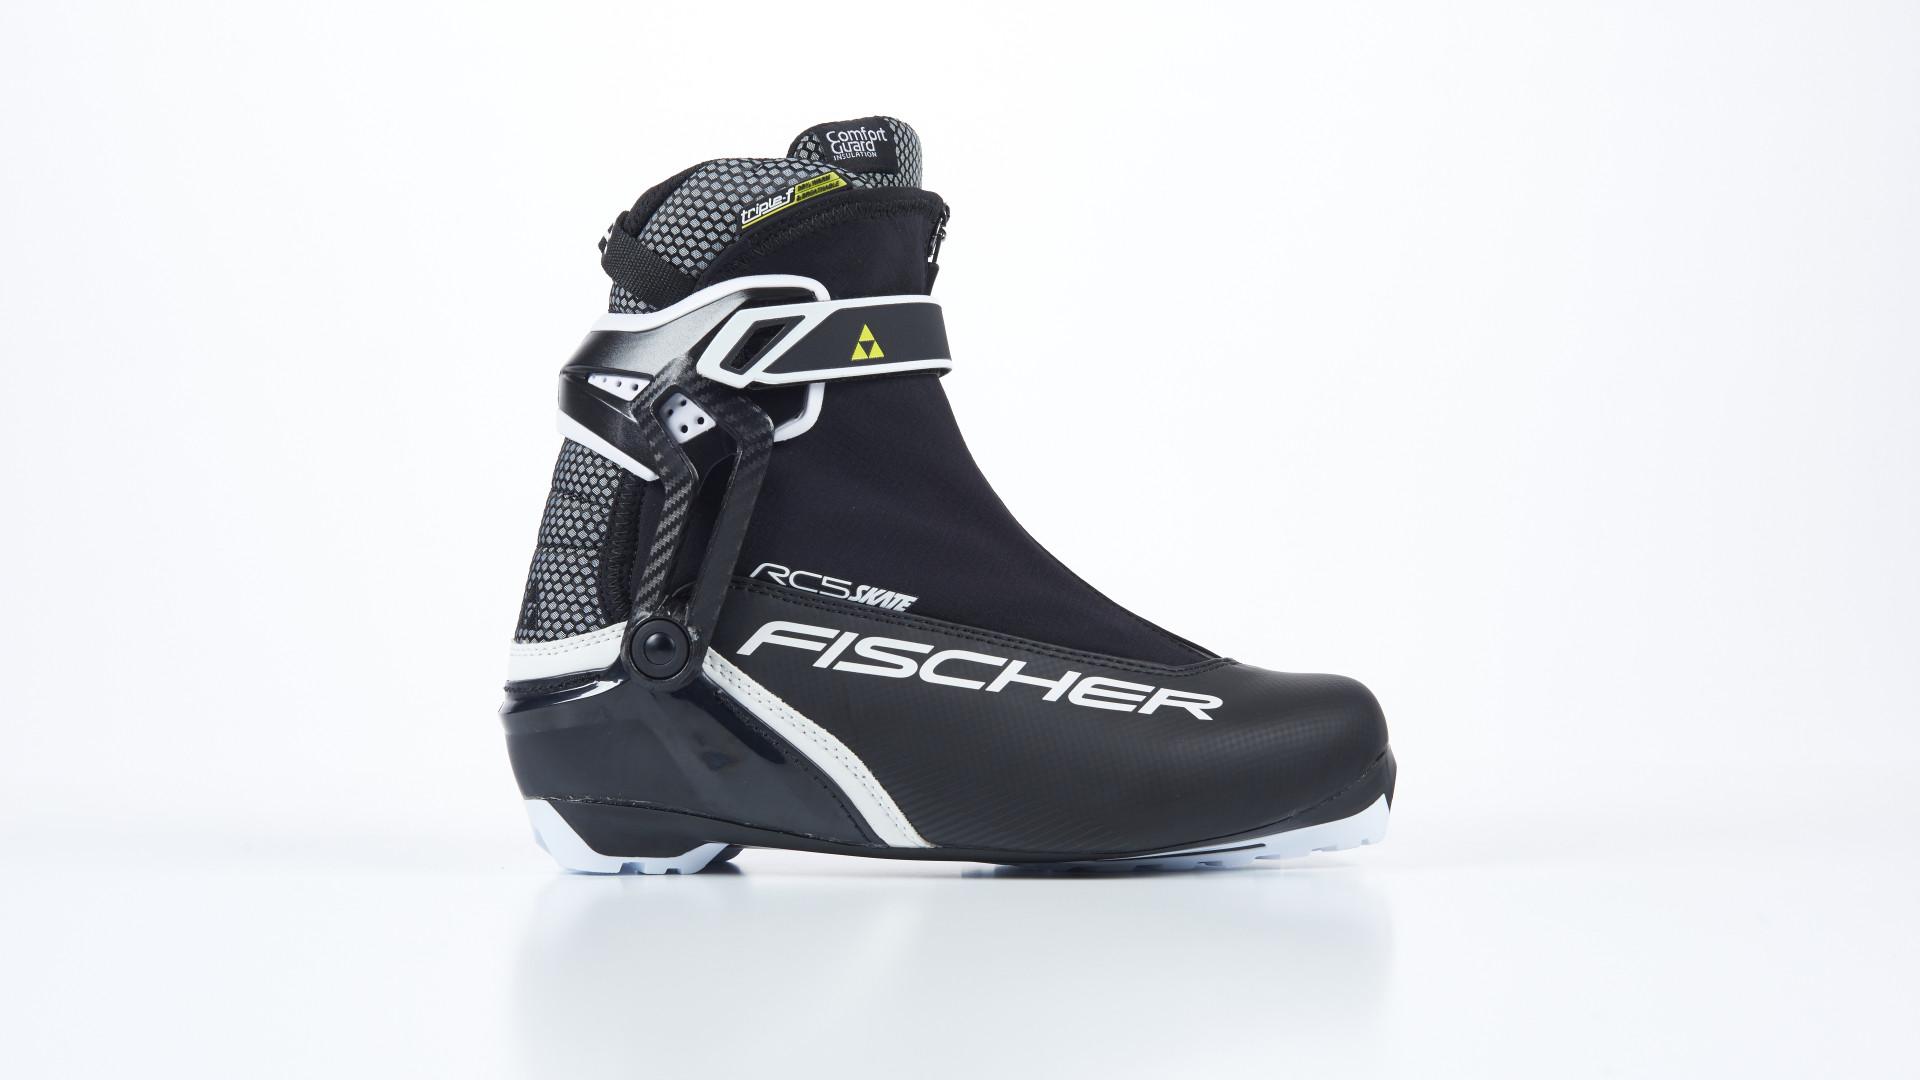 Langlaufschuhe RC5 Skate